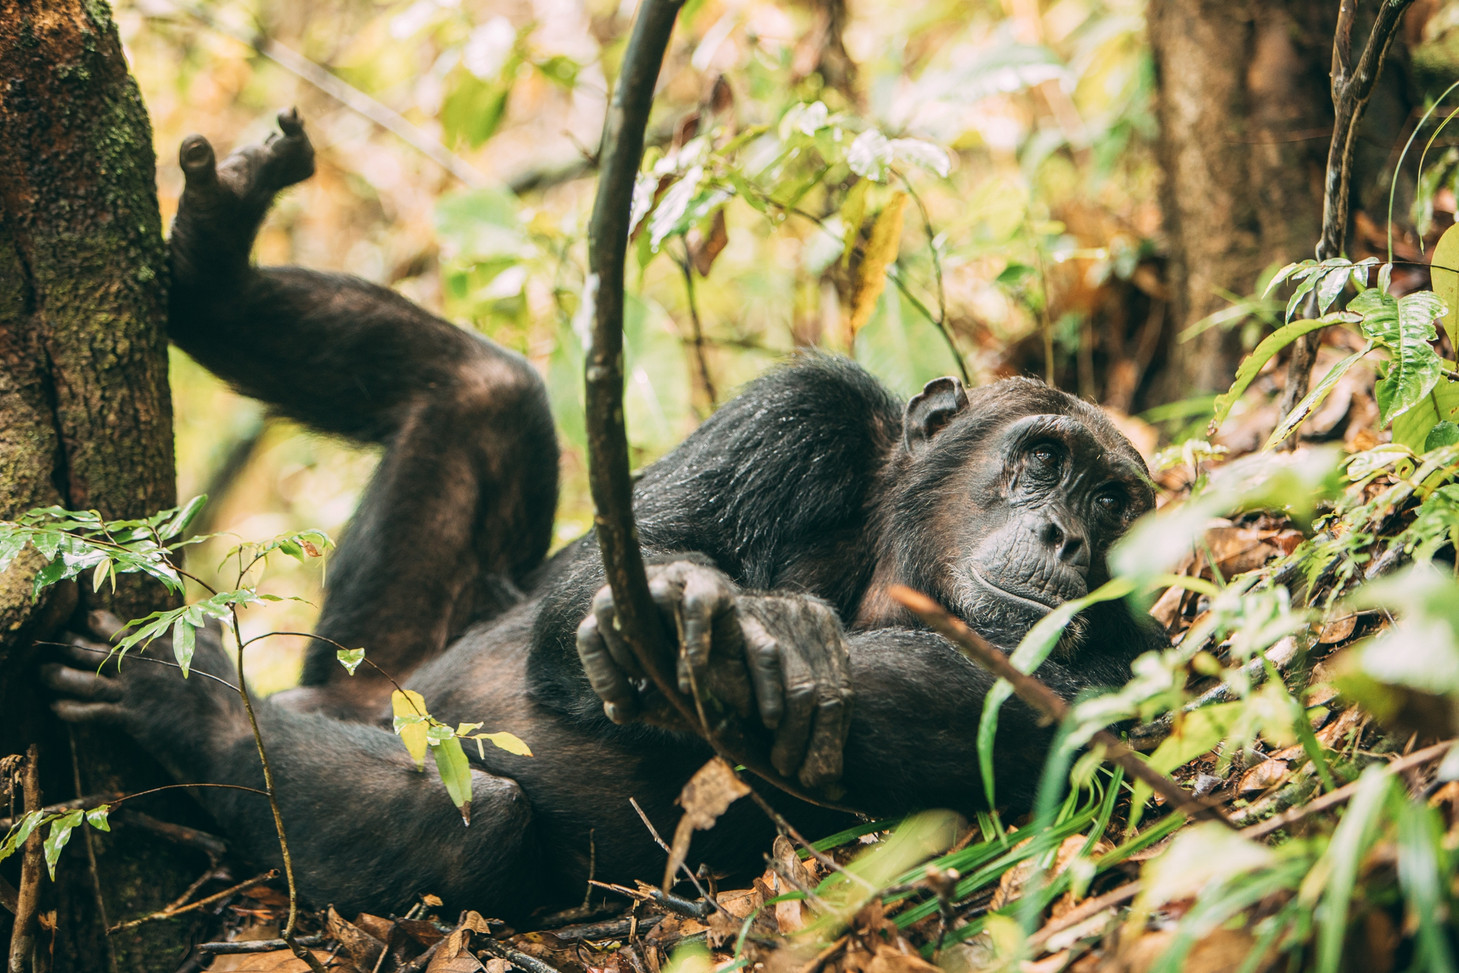 Relaxed Chimpanzee at Greystokes, Mahale, Tanzania